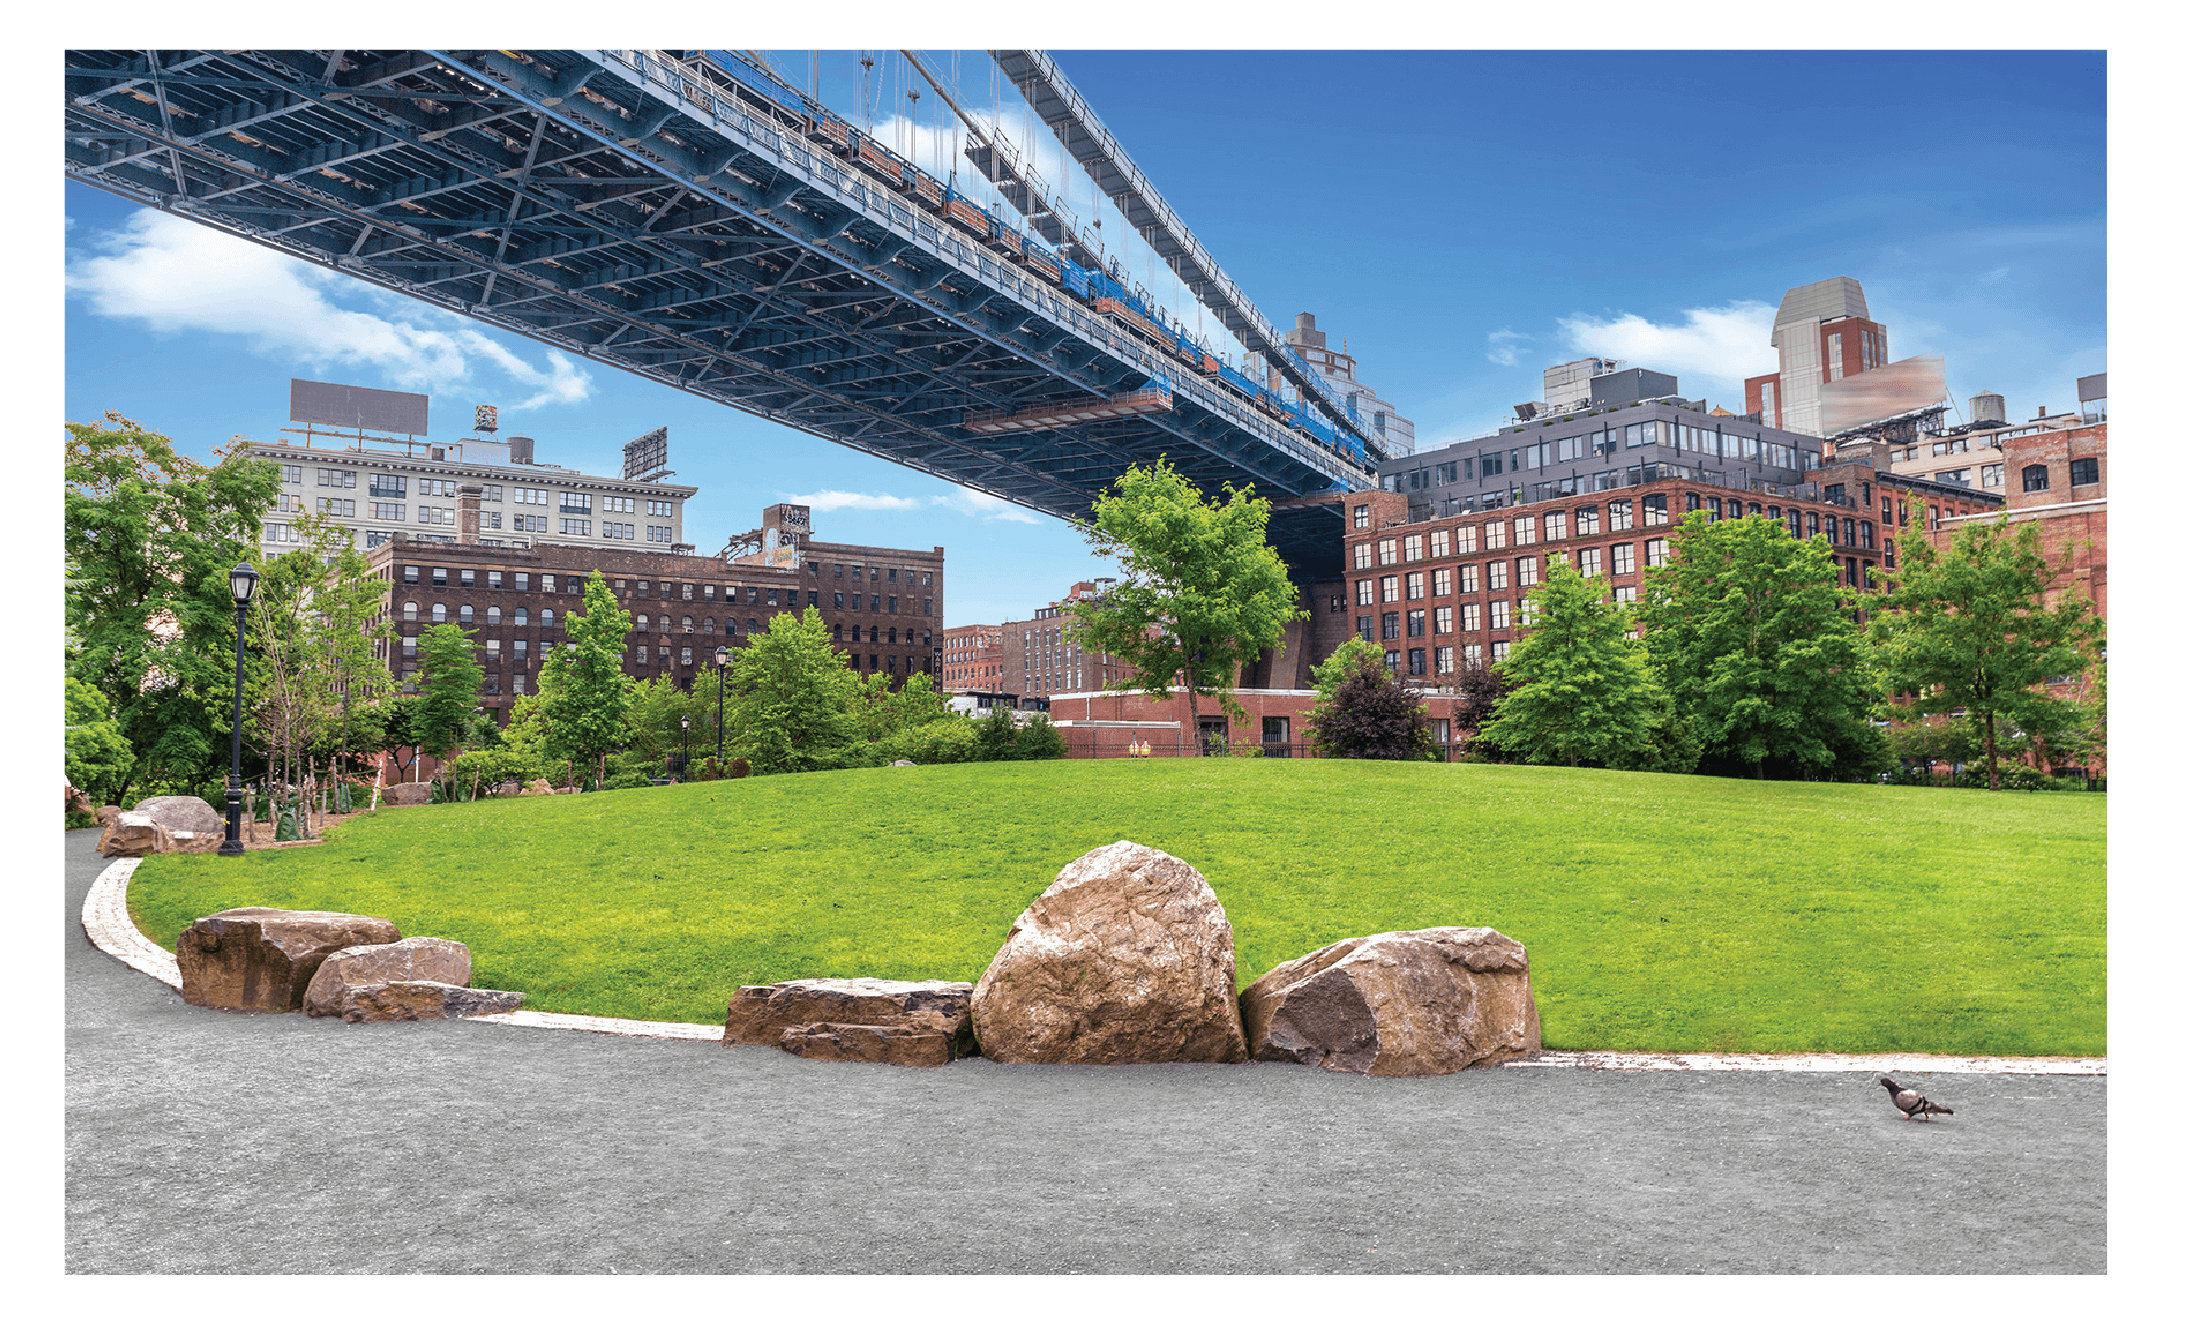 Brooklyn Bridge Park in Brooklyn, NY